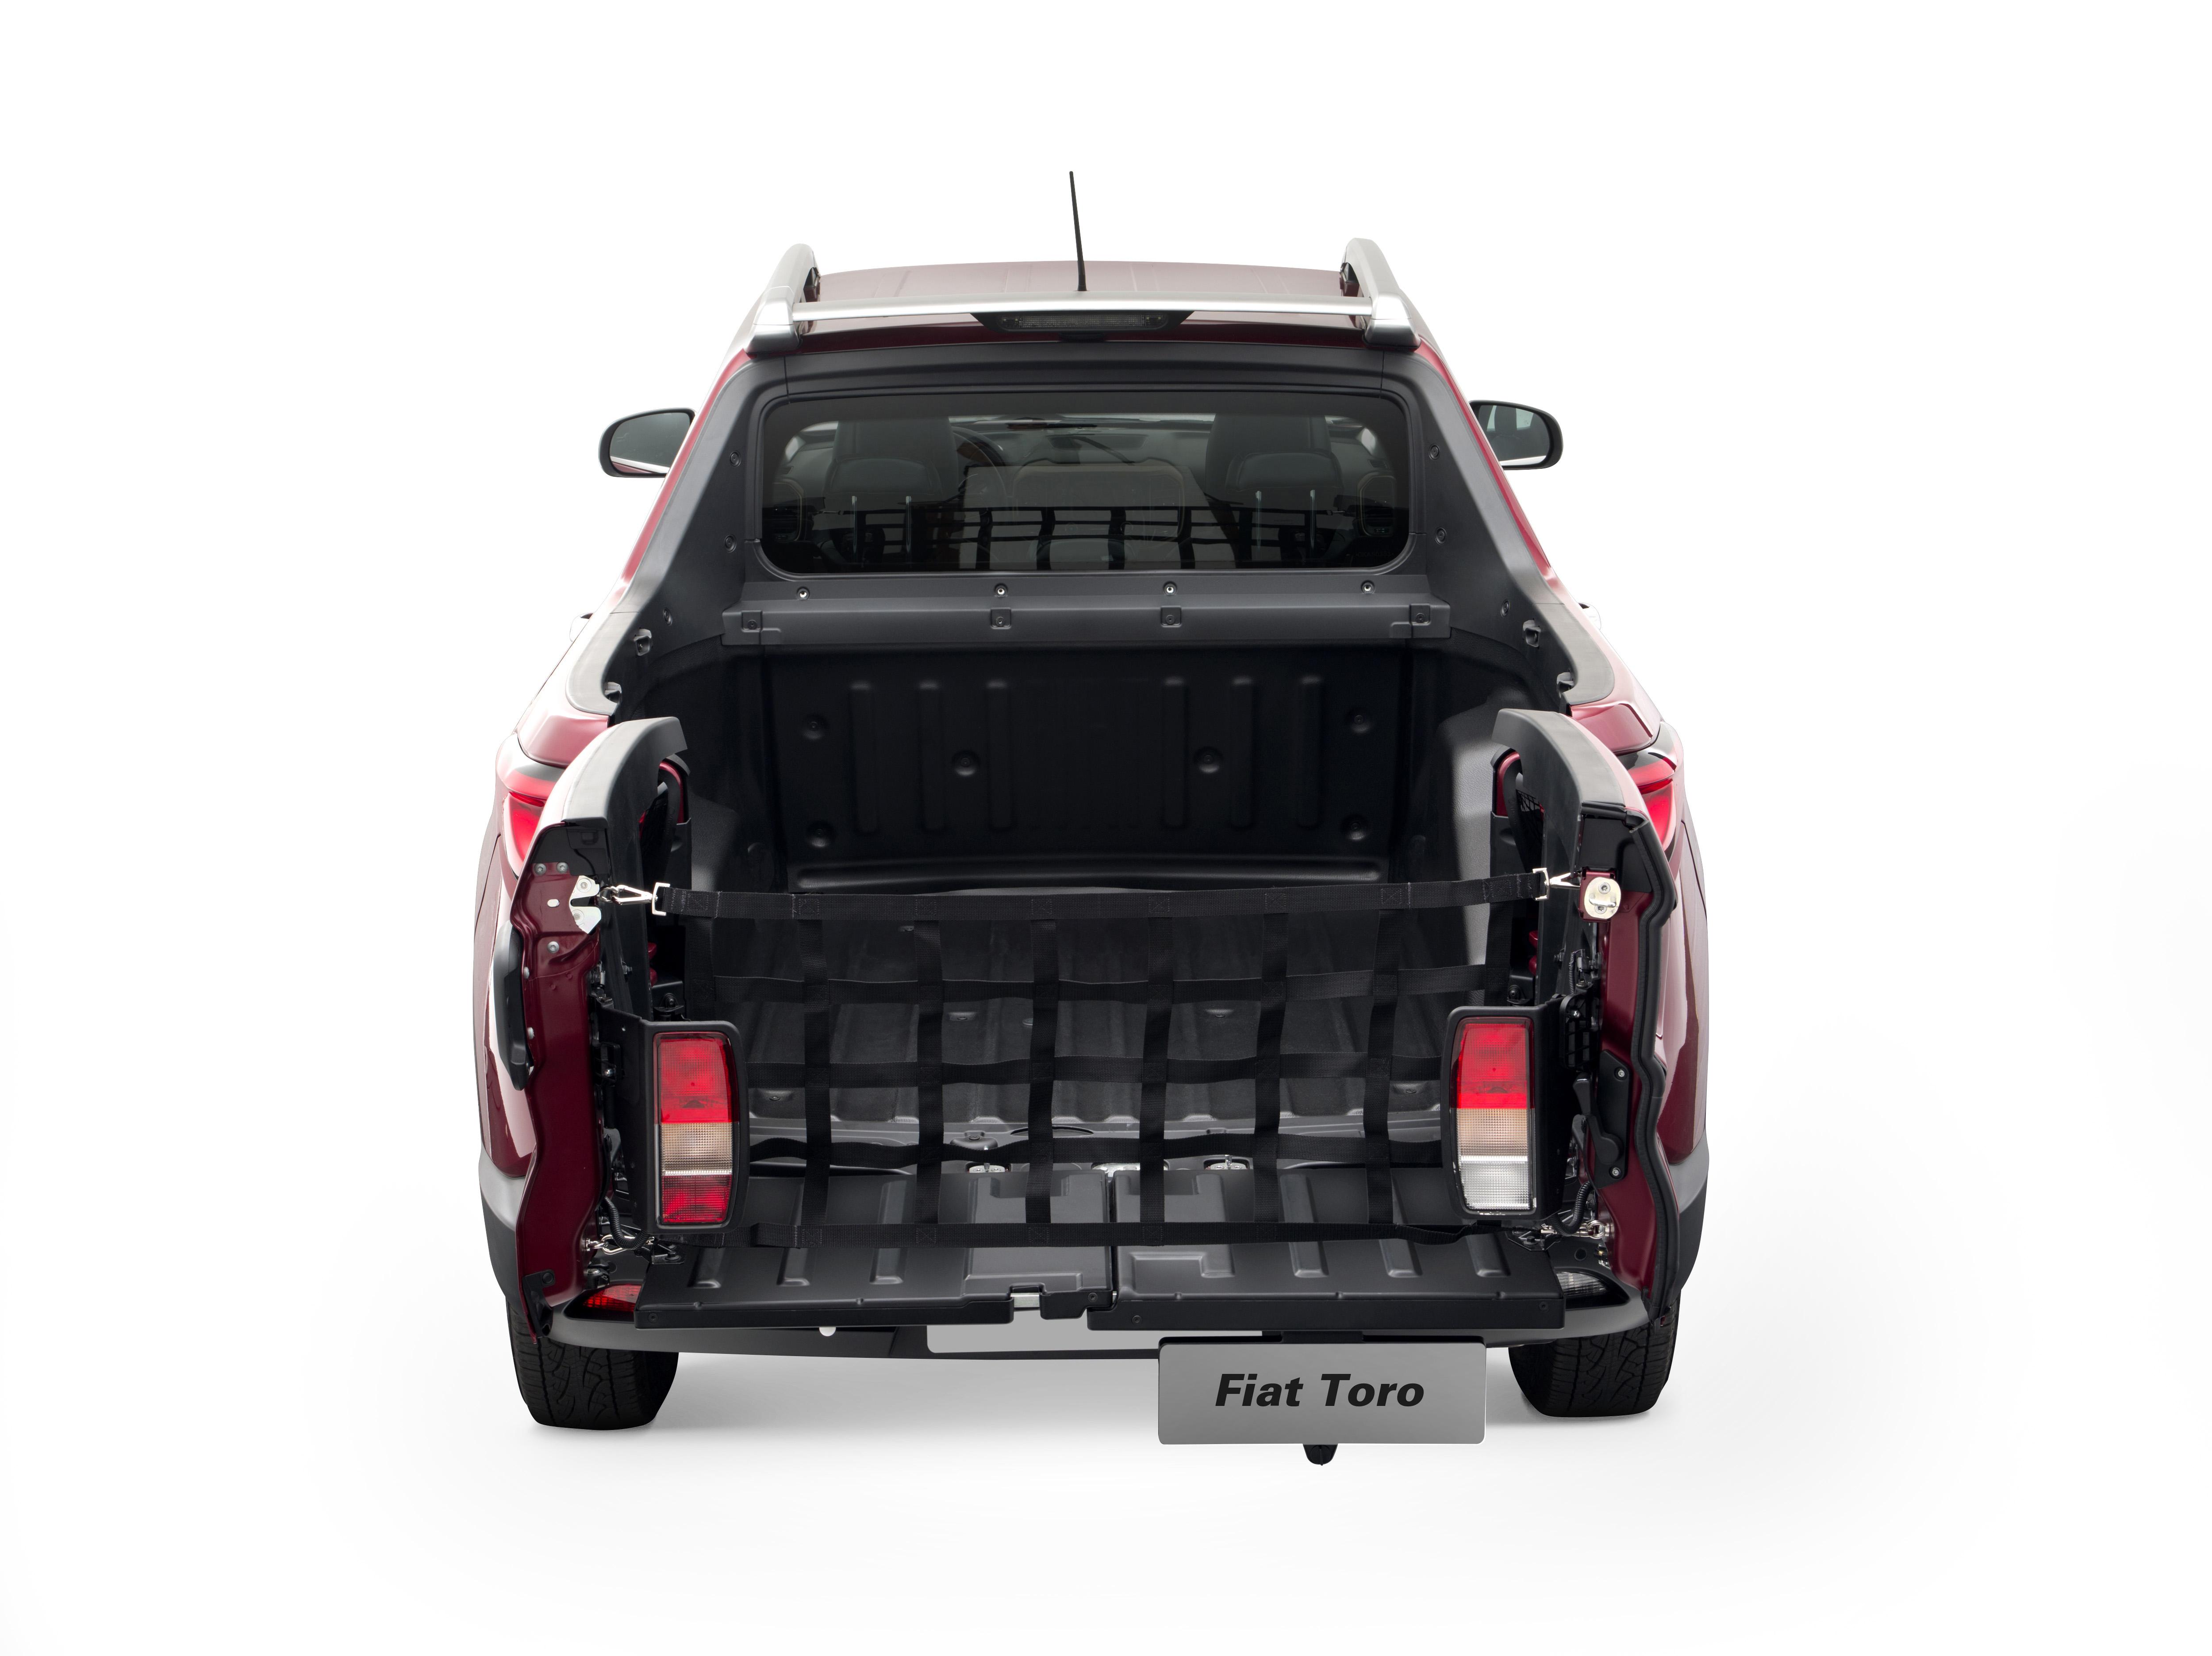 Fiat Toro - Extensor de caçamba